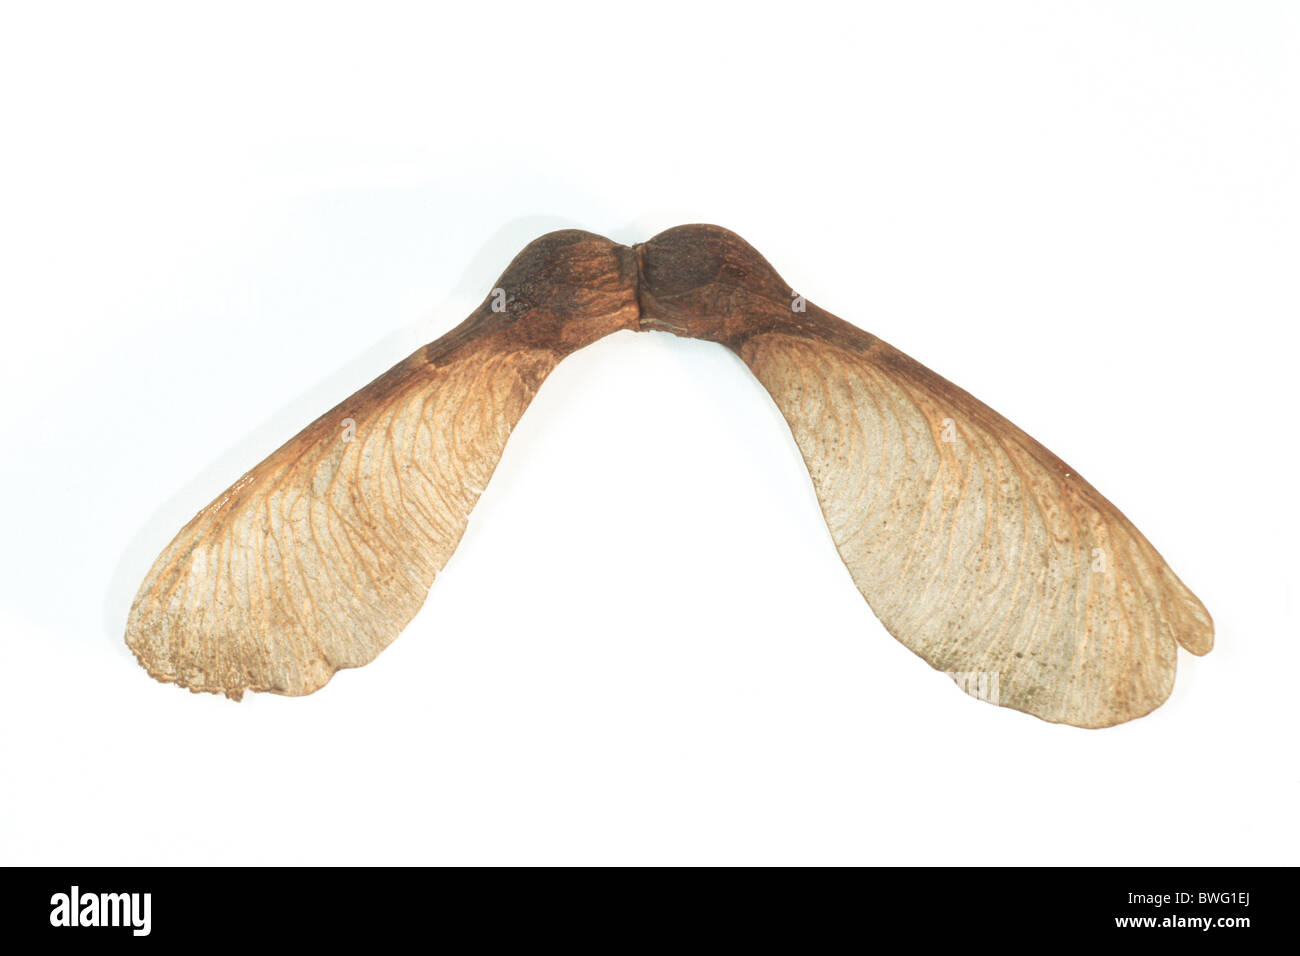 Whirlybirds Stock Photos & Whirlybirds Stock Images - Alamy